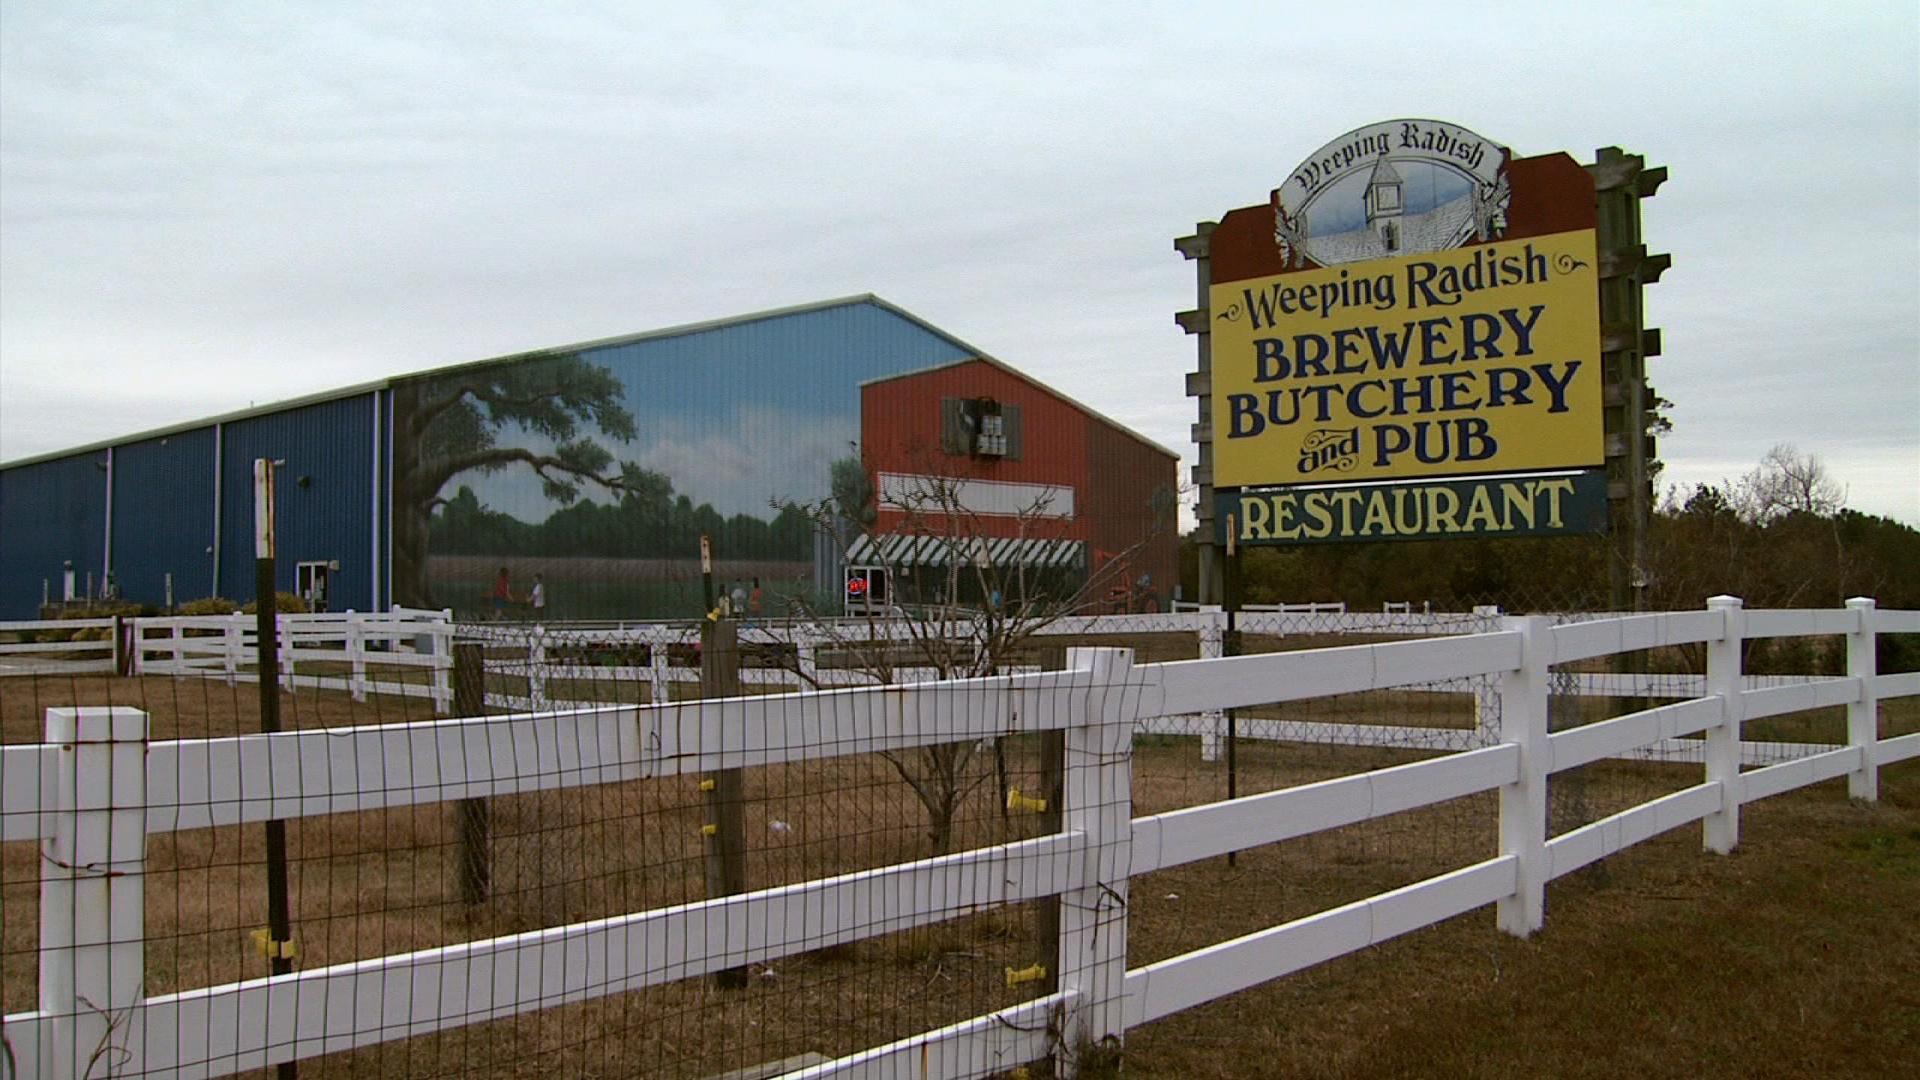 Weeping Radish Brewery; Grandy, NC image